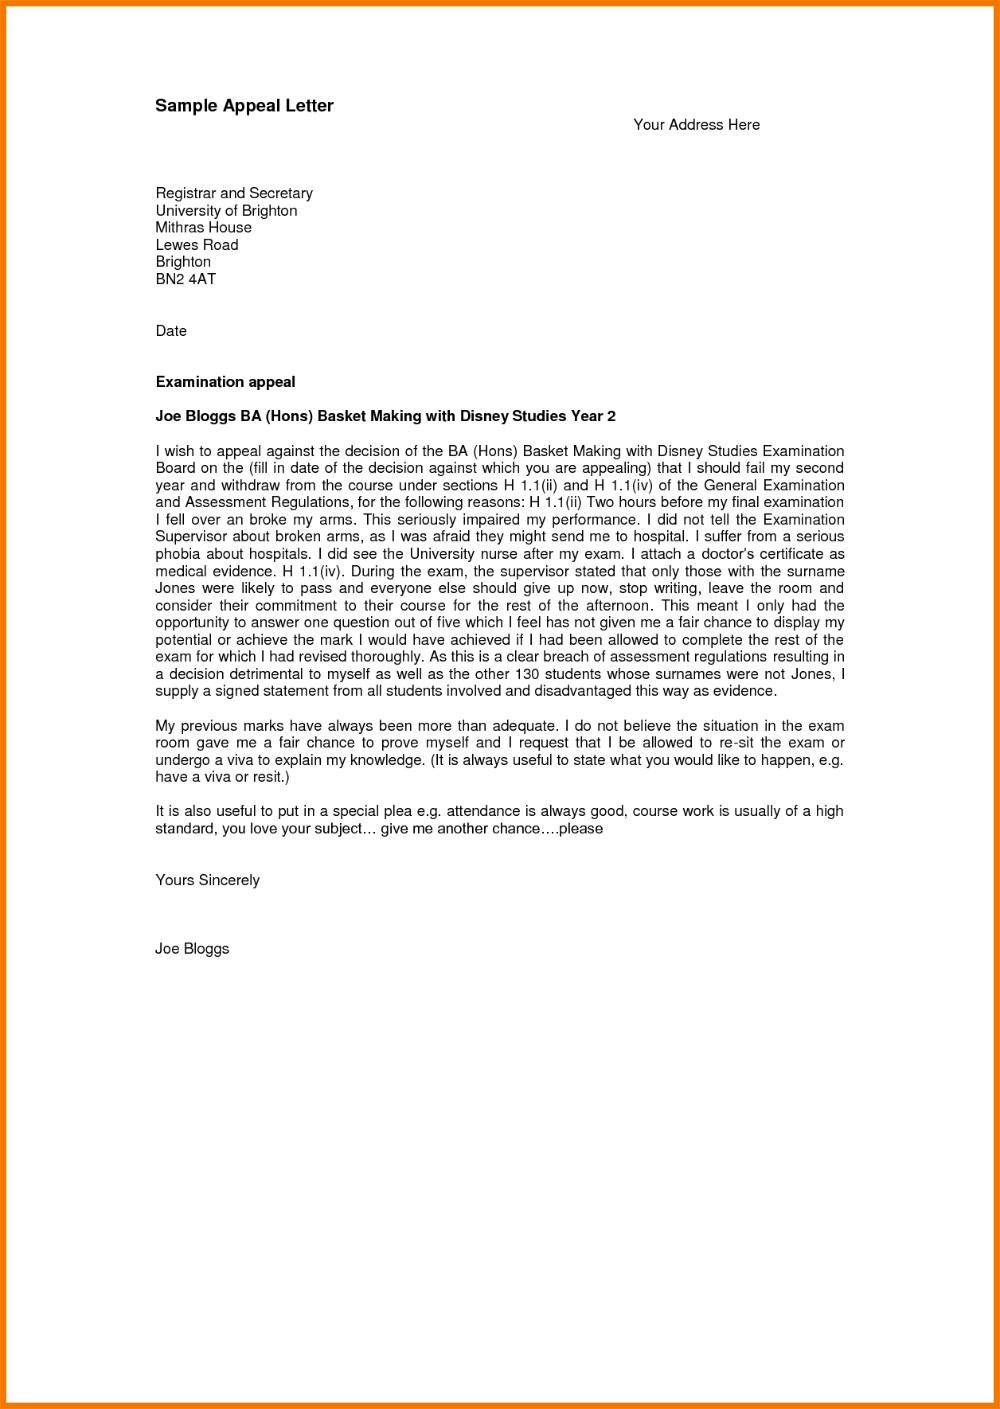 sample sap appeal letter geluidinbeeld pertaining to entry level linguist resume ba skills cv design free download word